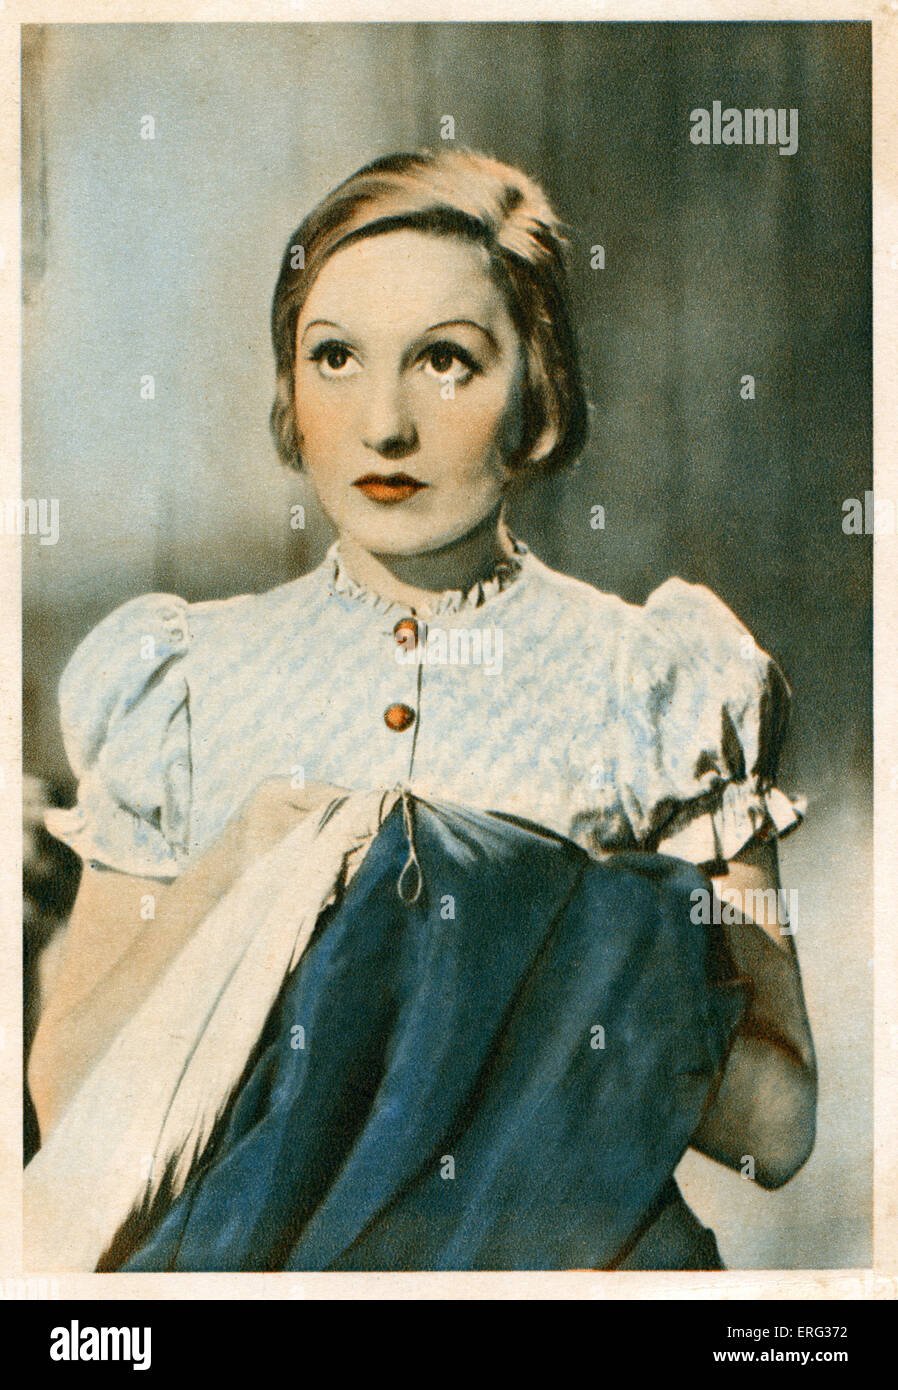 Elisabeth Bergner, Austrian-Ukrainian actress 22 August 1897 - 12 May 1986. - Stock Image